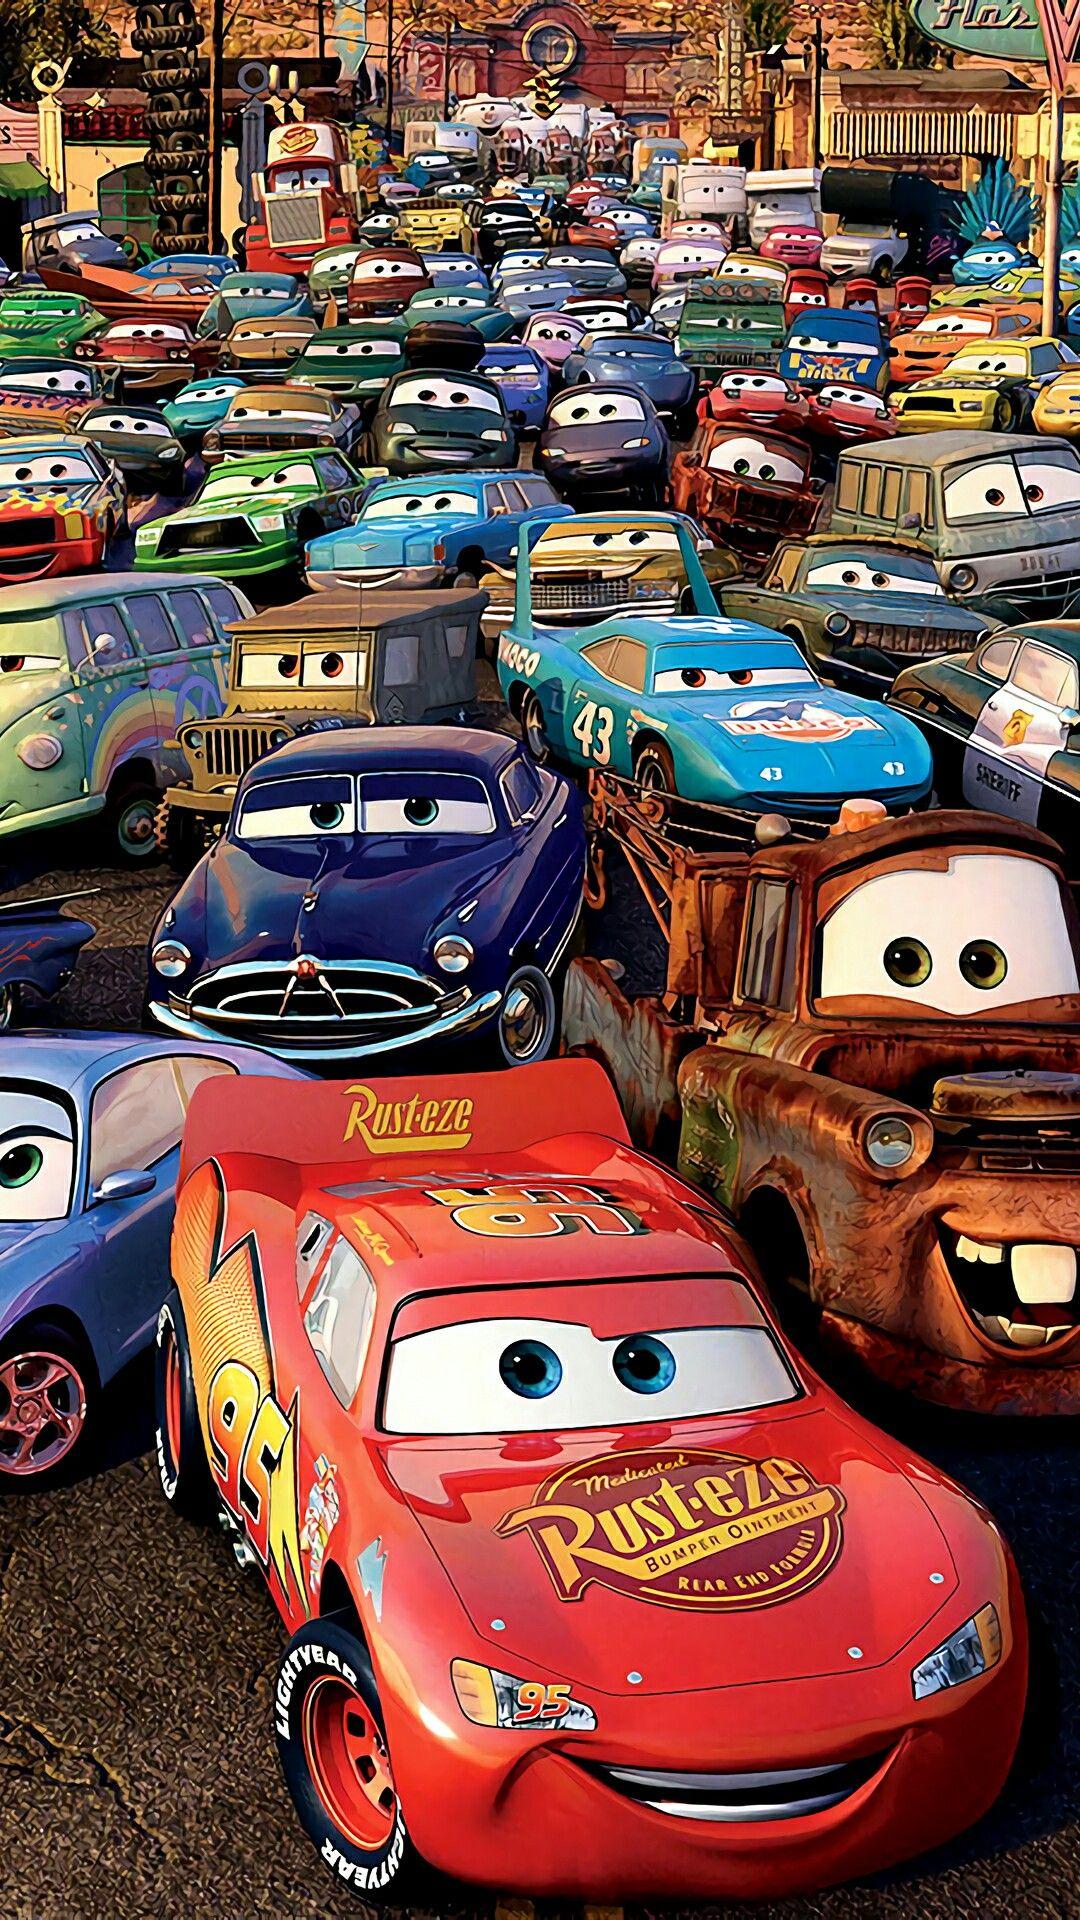 Idea by Ditmir Ulqinaku on Anime Disney cars movie